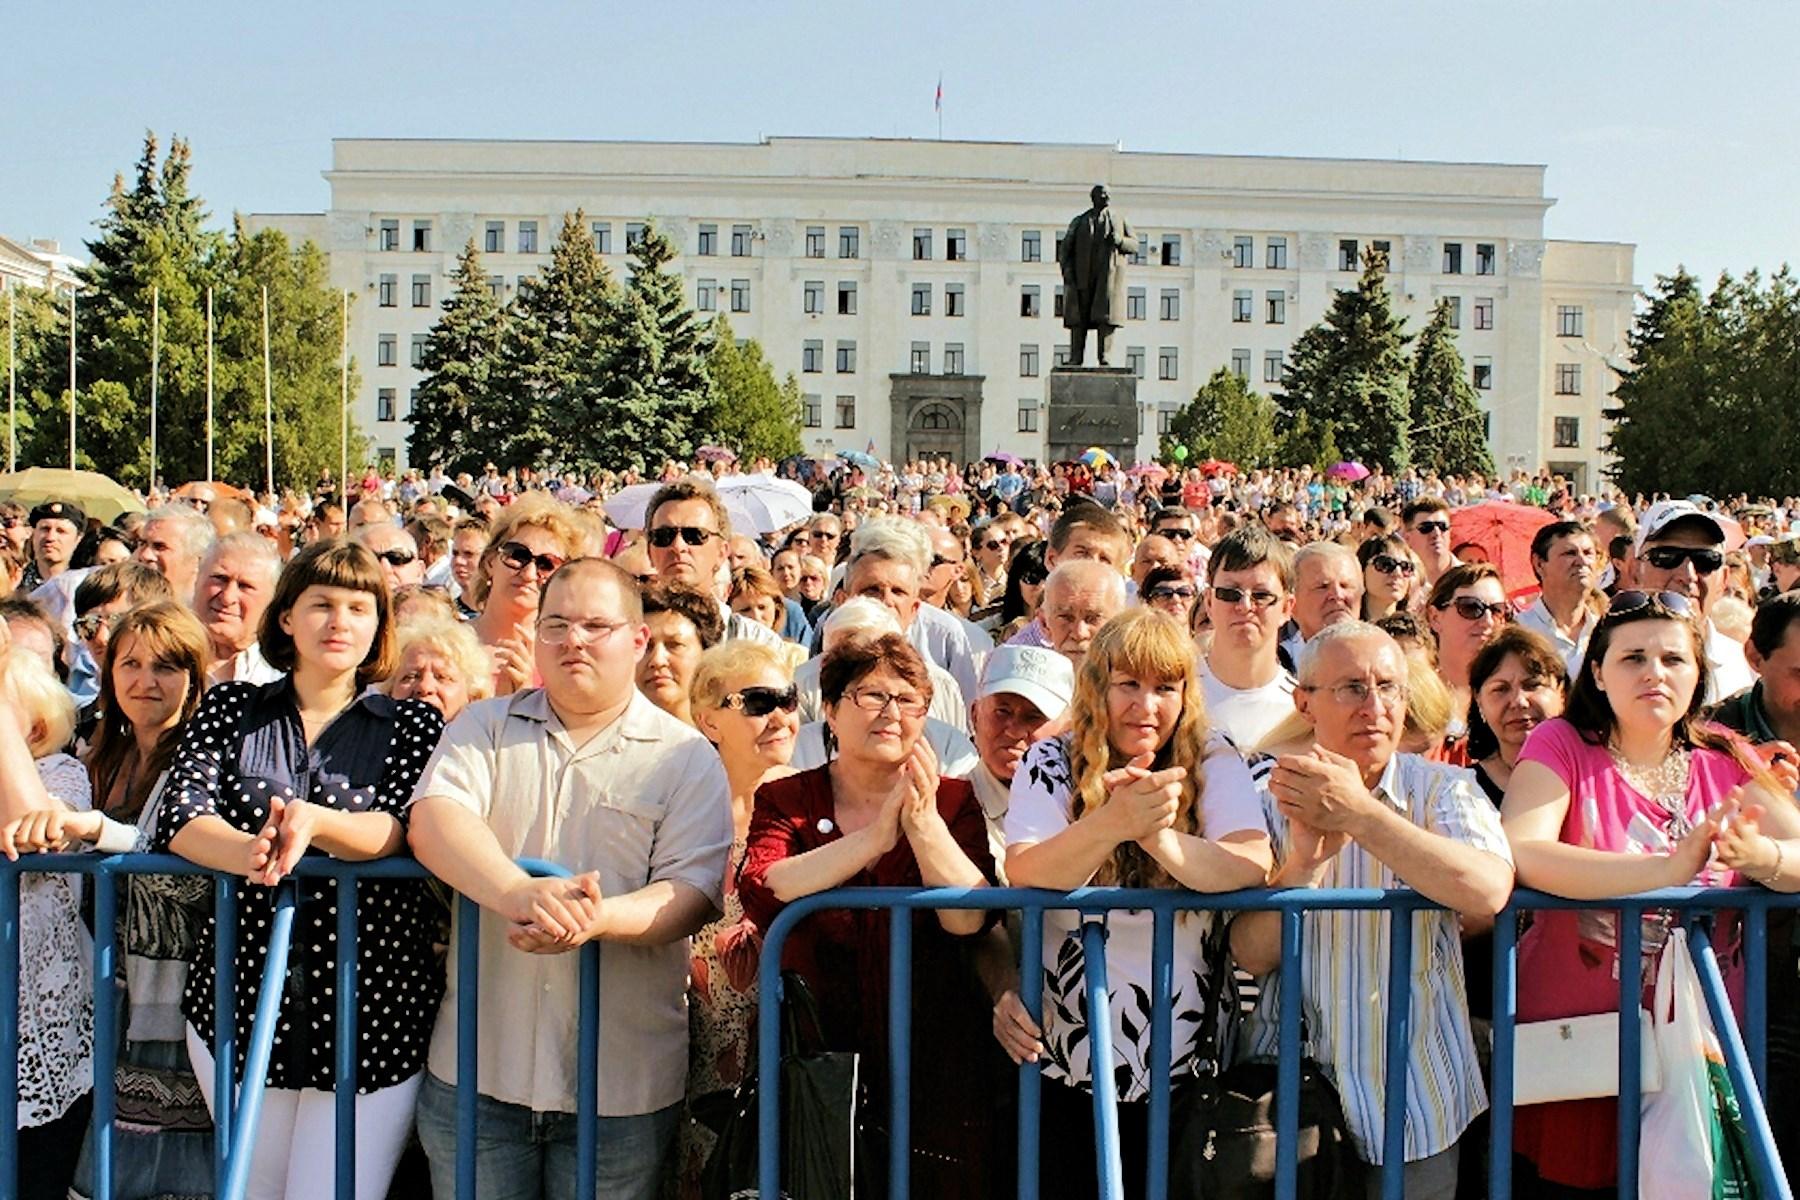 00 kobzon concert. lugansk. lnr. 05. 27.05.15